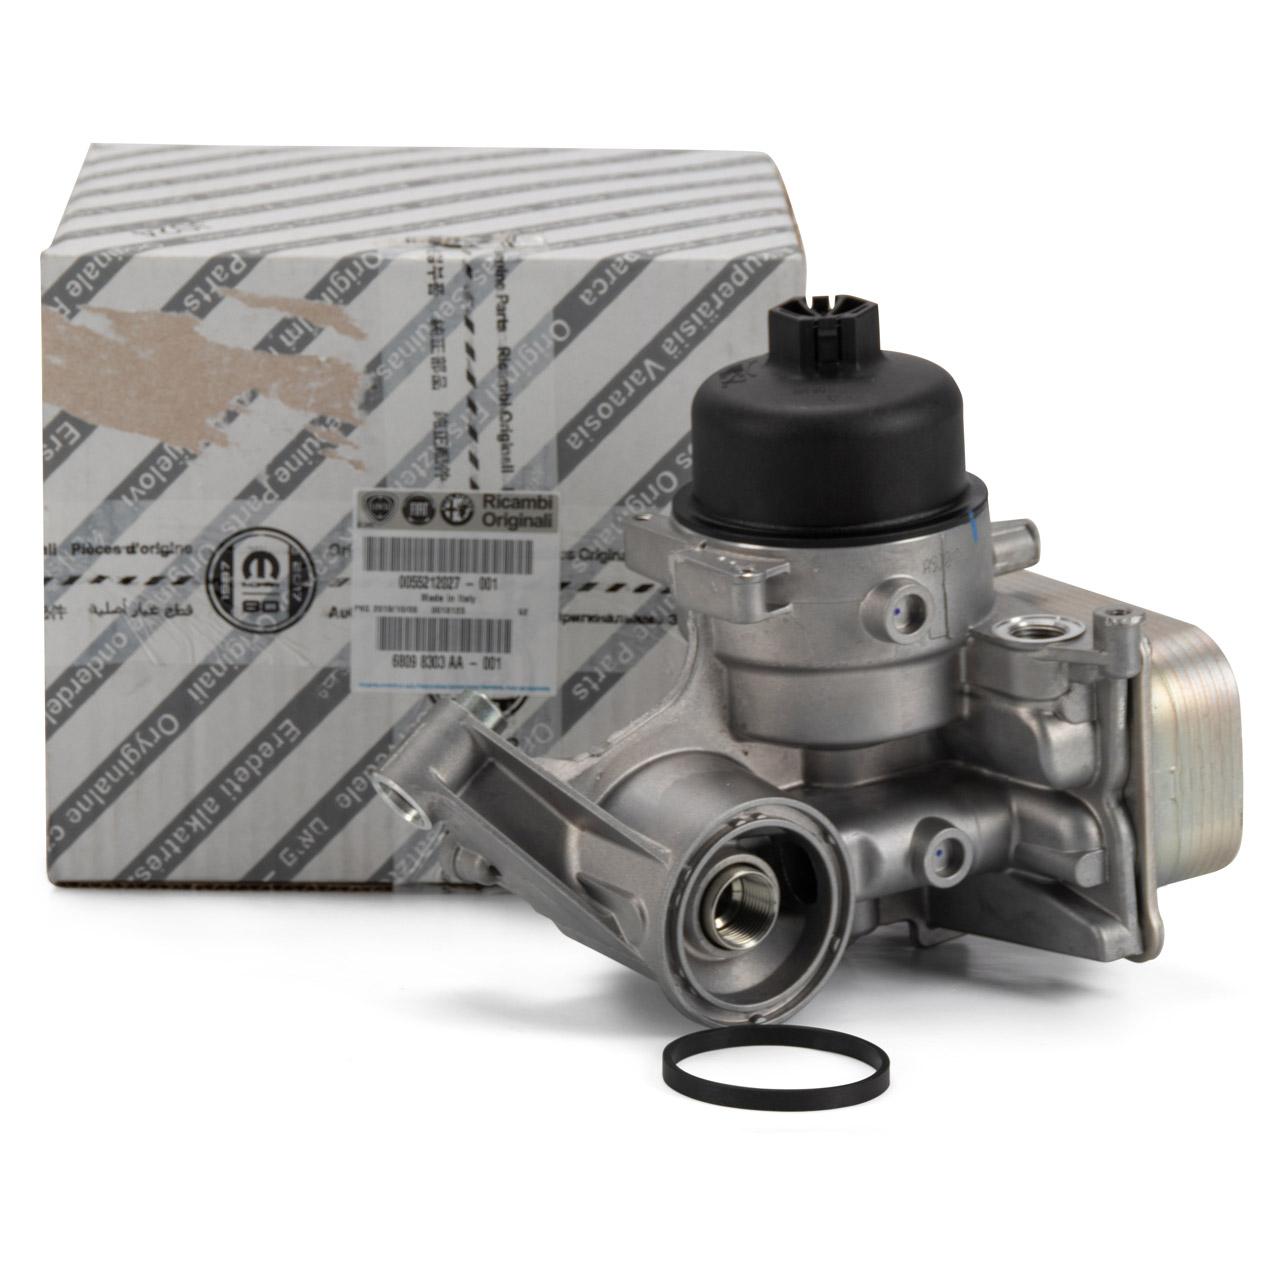 ORIGINAL Fiat Ölkühler inkl. Dichtung DOBLO BRAVO II GRANDE PUNTO LINEA 1.4 55212027